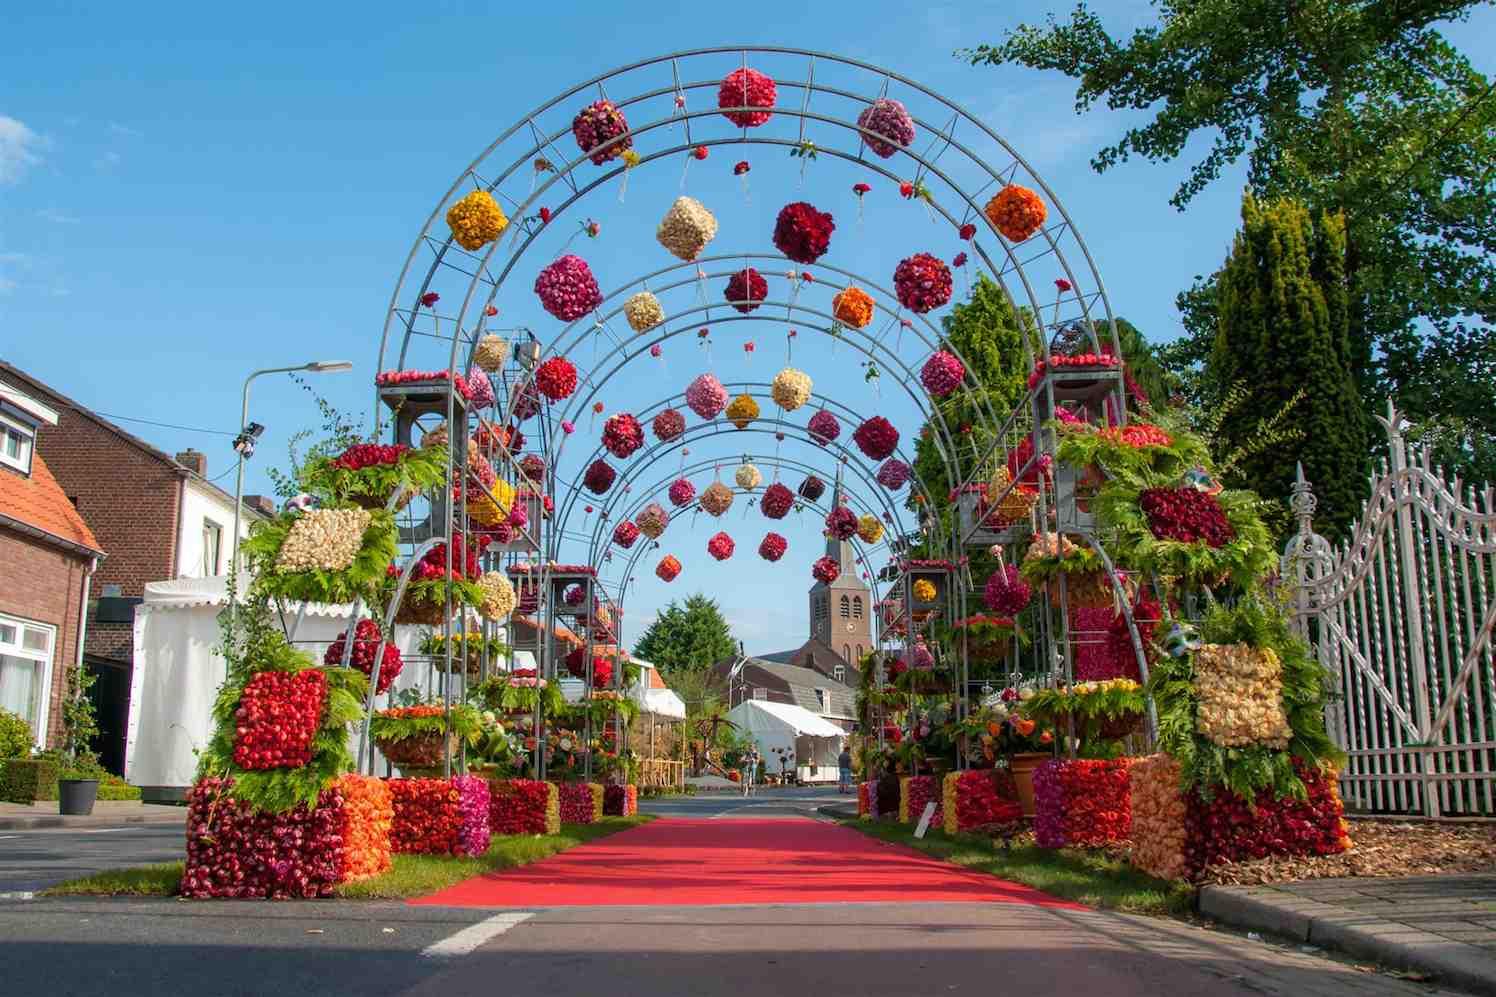 rozenfestival, rozendorp Lottum